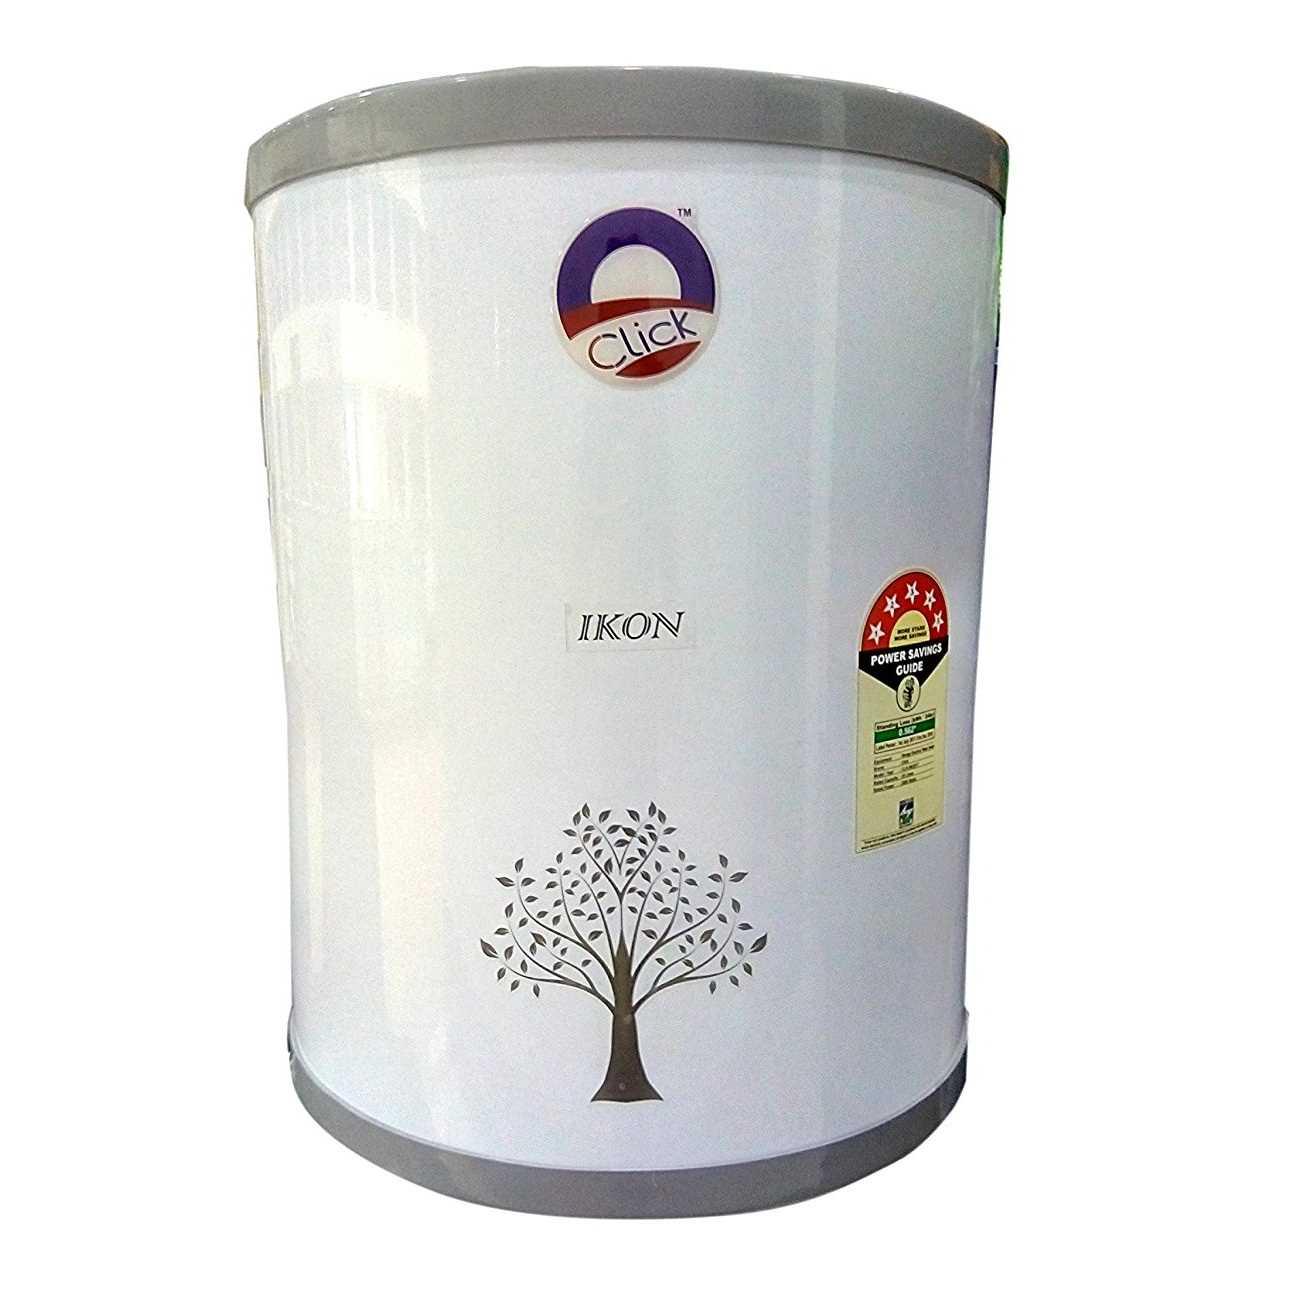 Click Ikon 15 Litre Storage Water Heater